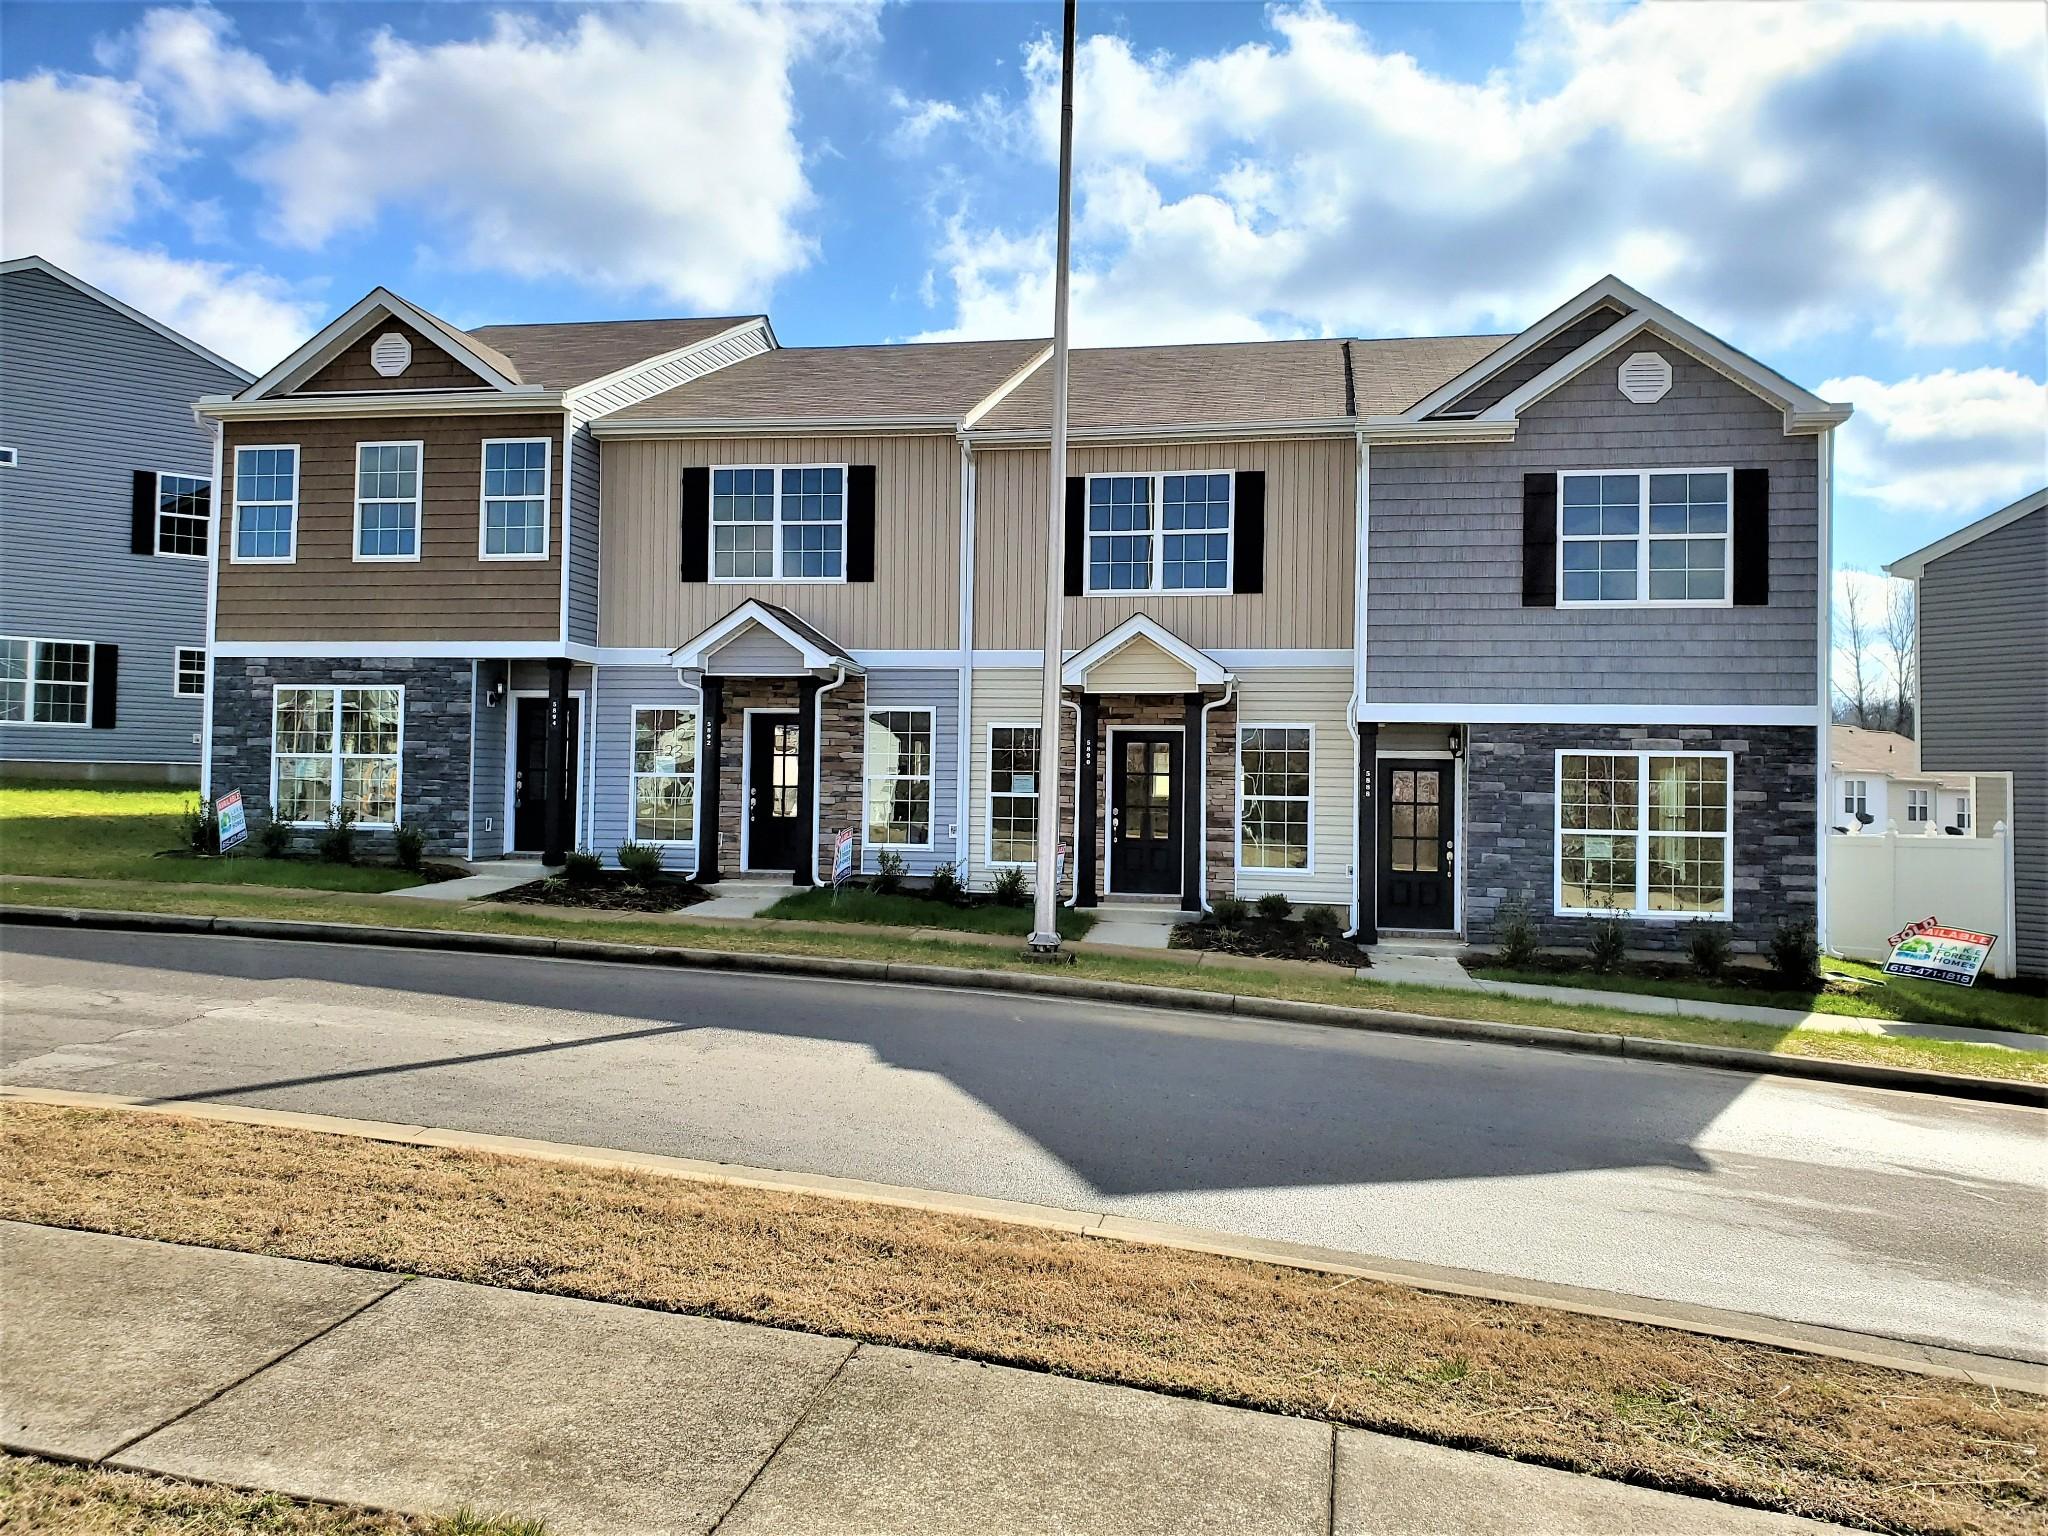 5890 Monroe XING, Antioch, TN 37013 - Antioch, TN real estate listing